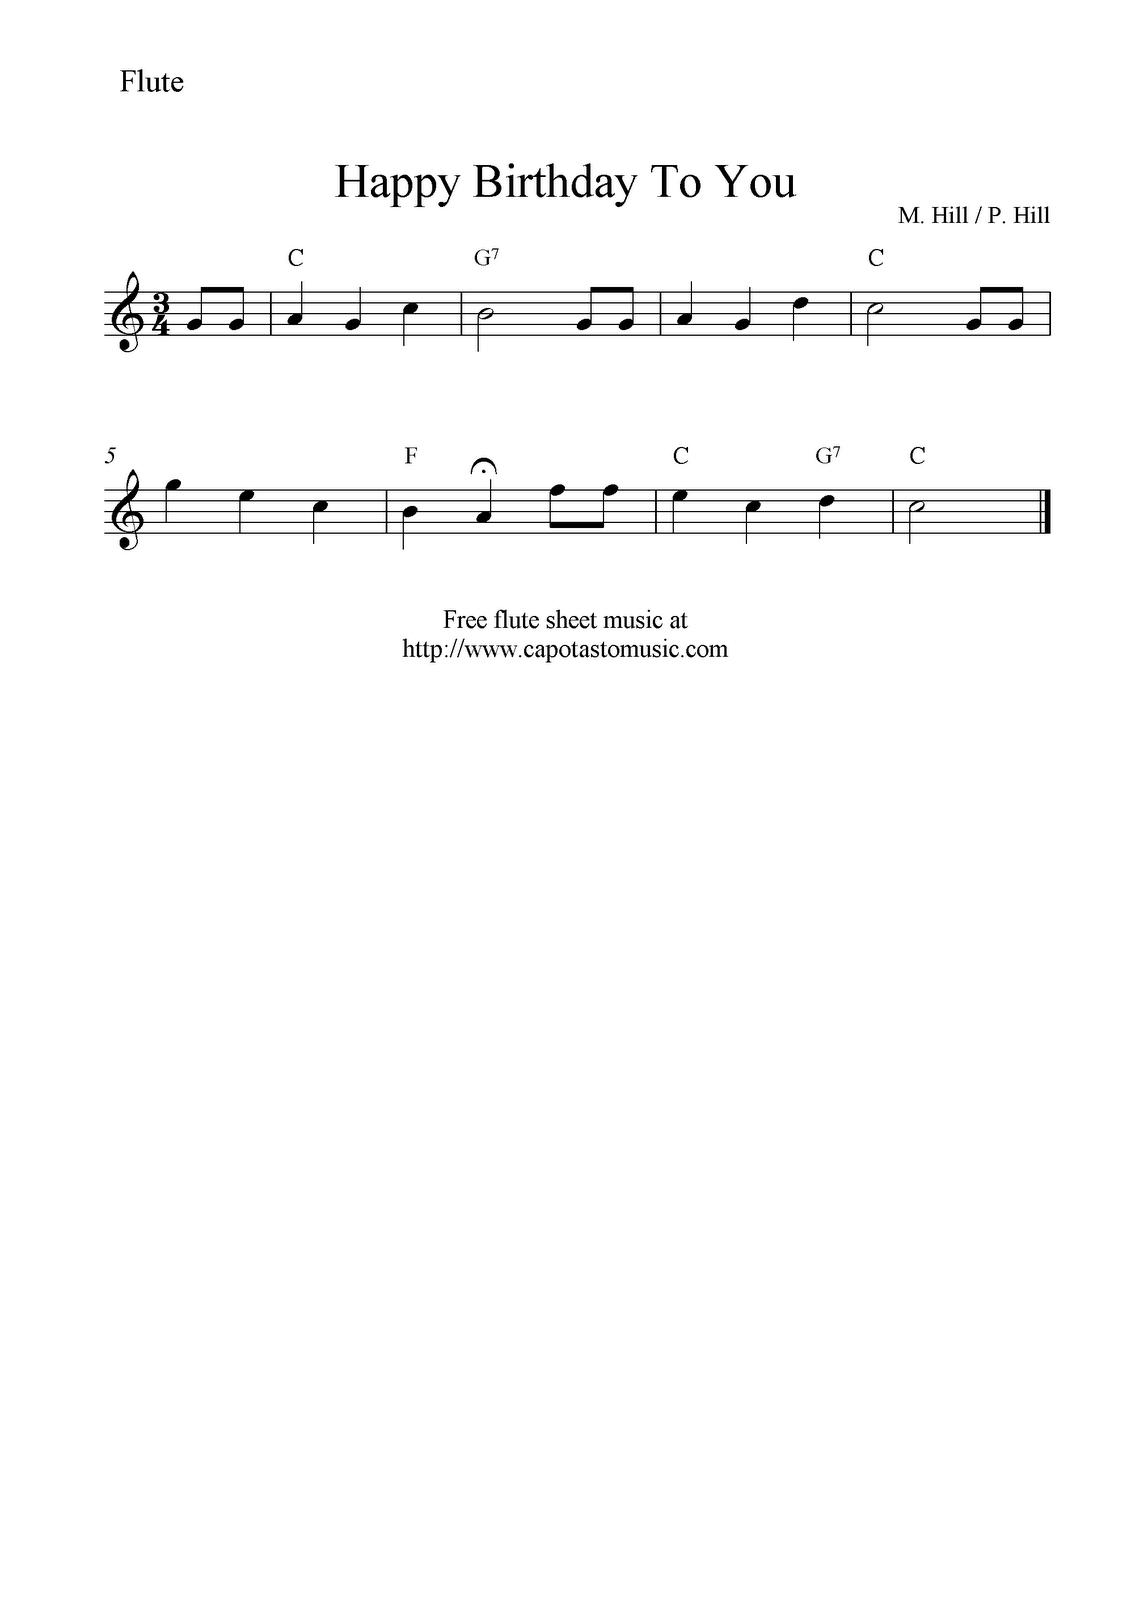 Free Sheet Music Scores: Happy Birthday To You, Free Flute Sheet - Free Printable Flute Sheet Music